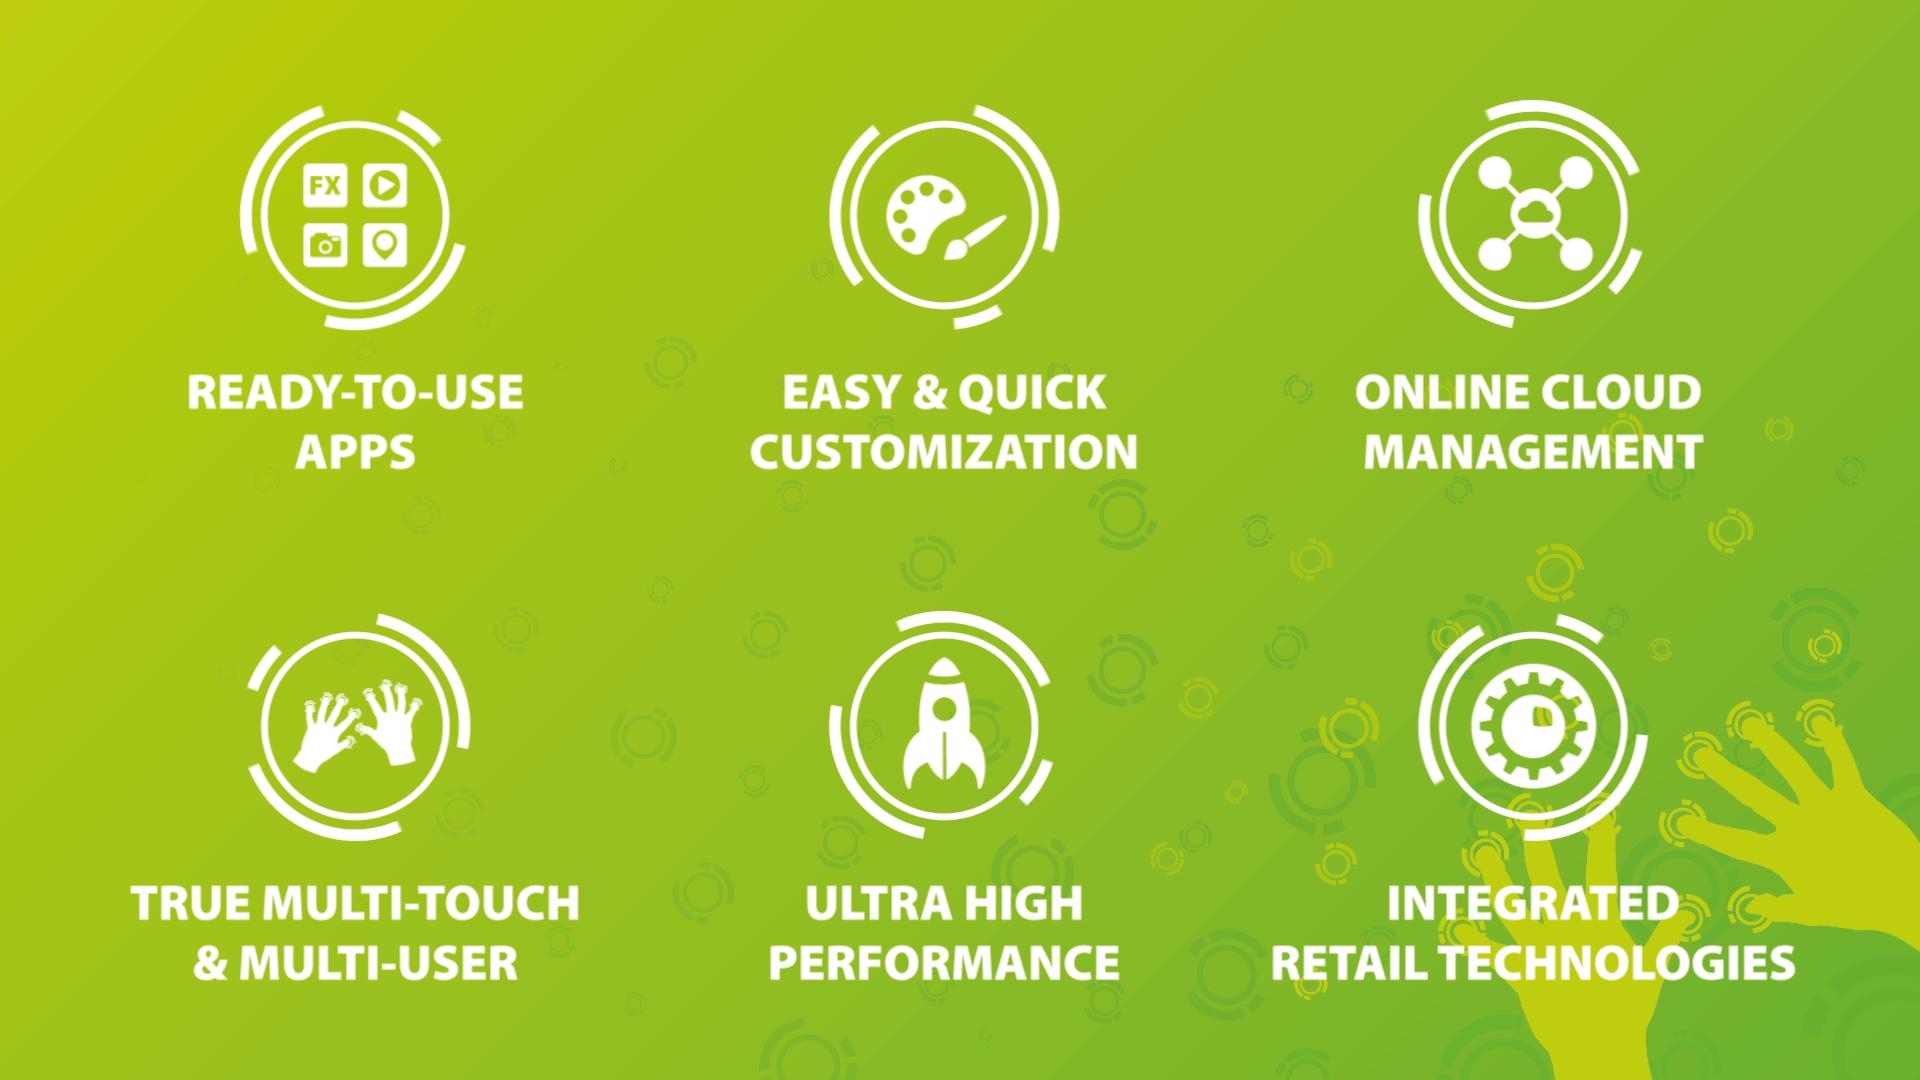 Interactive Digital Signage Touchscreen Software: Benefits